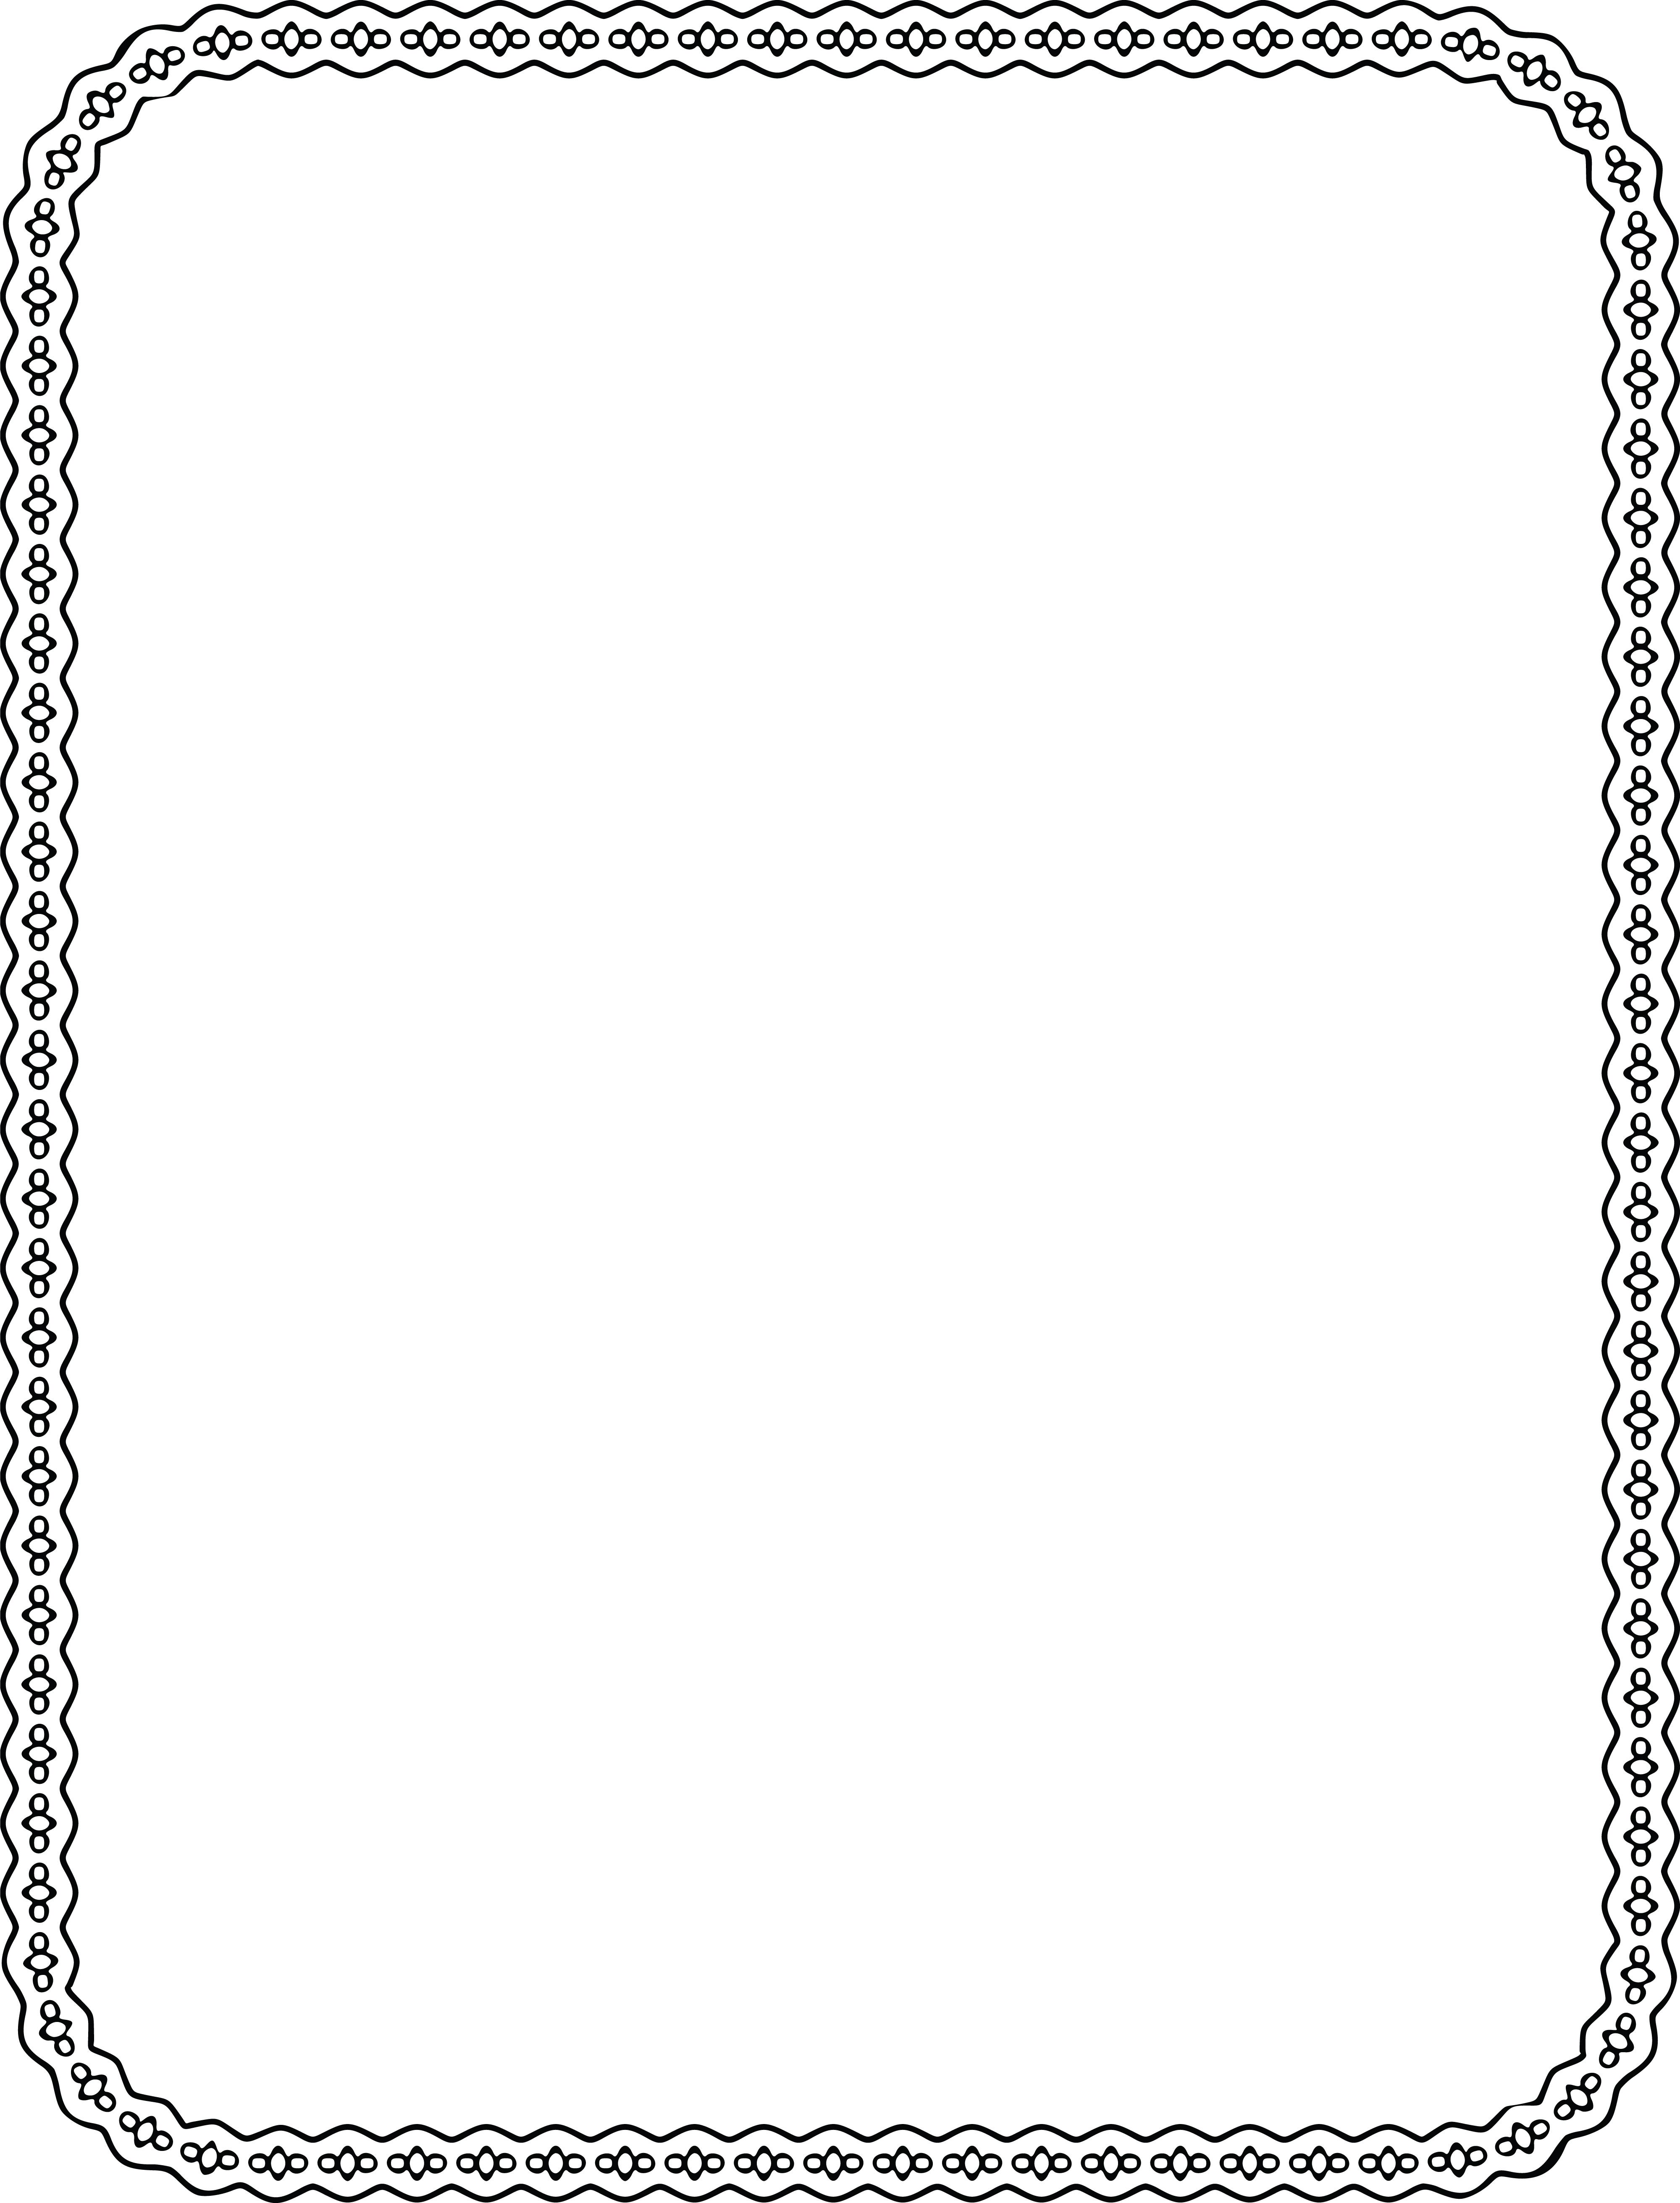 Free Clipart Of a Decorative Border.